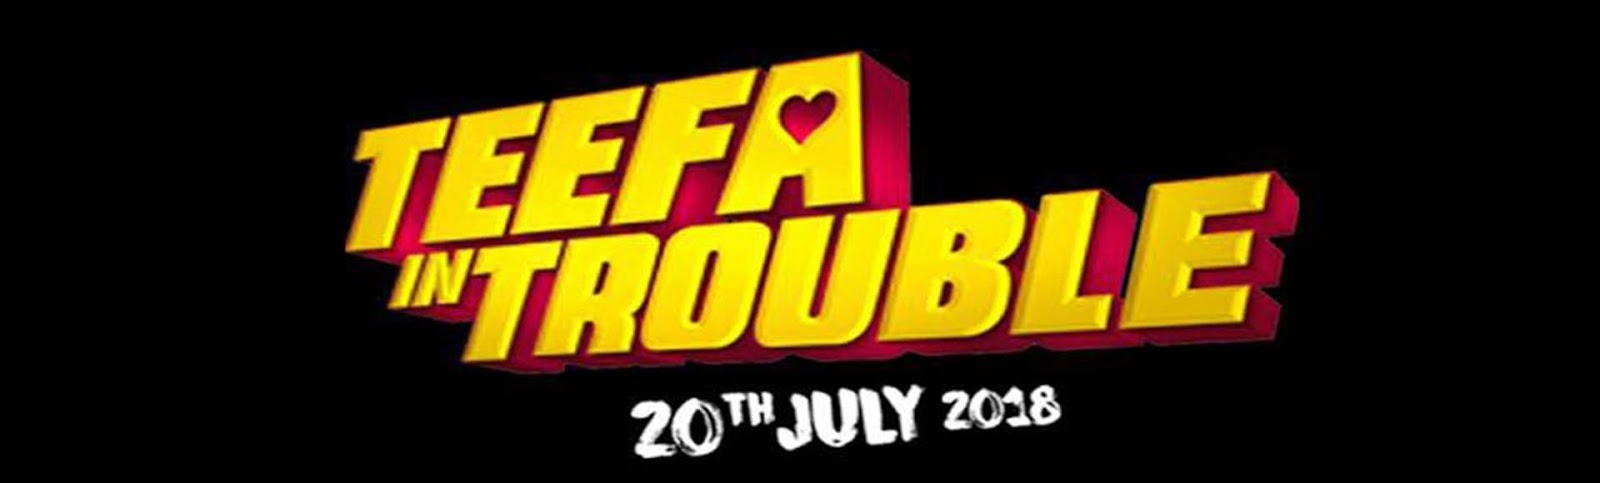 Upcoming Pakistani movie Teefa in Trouble